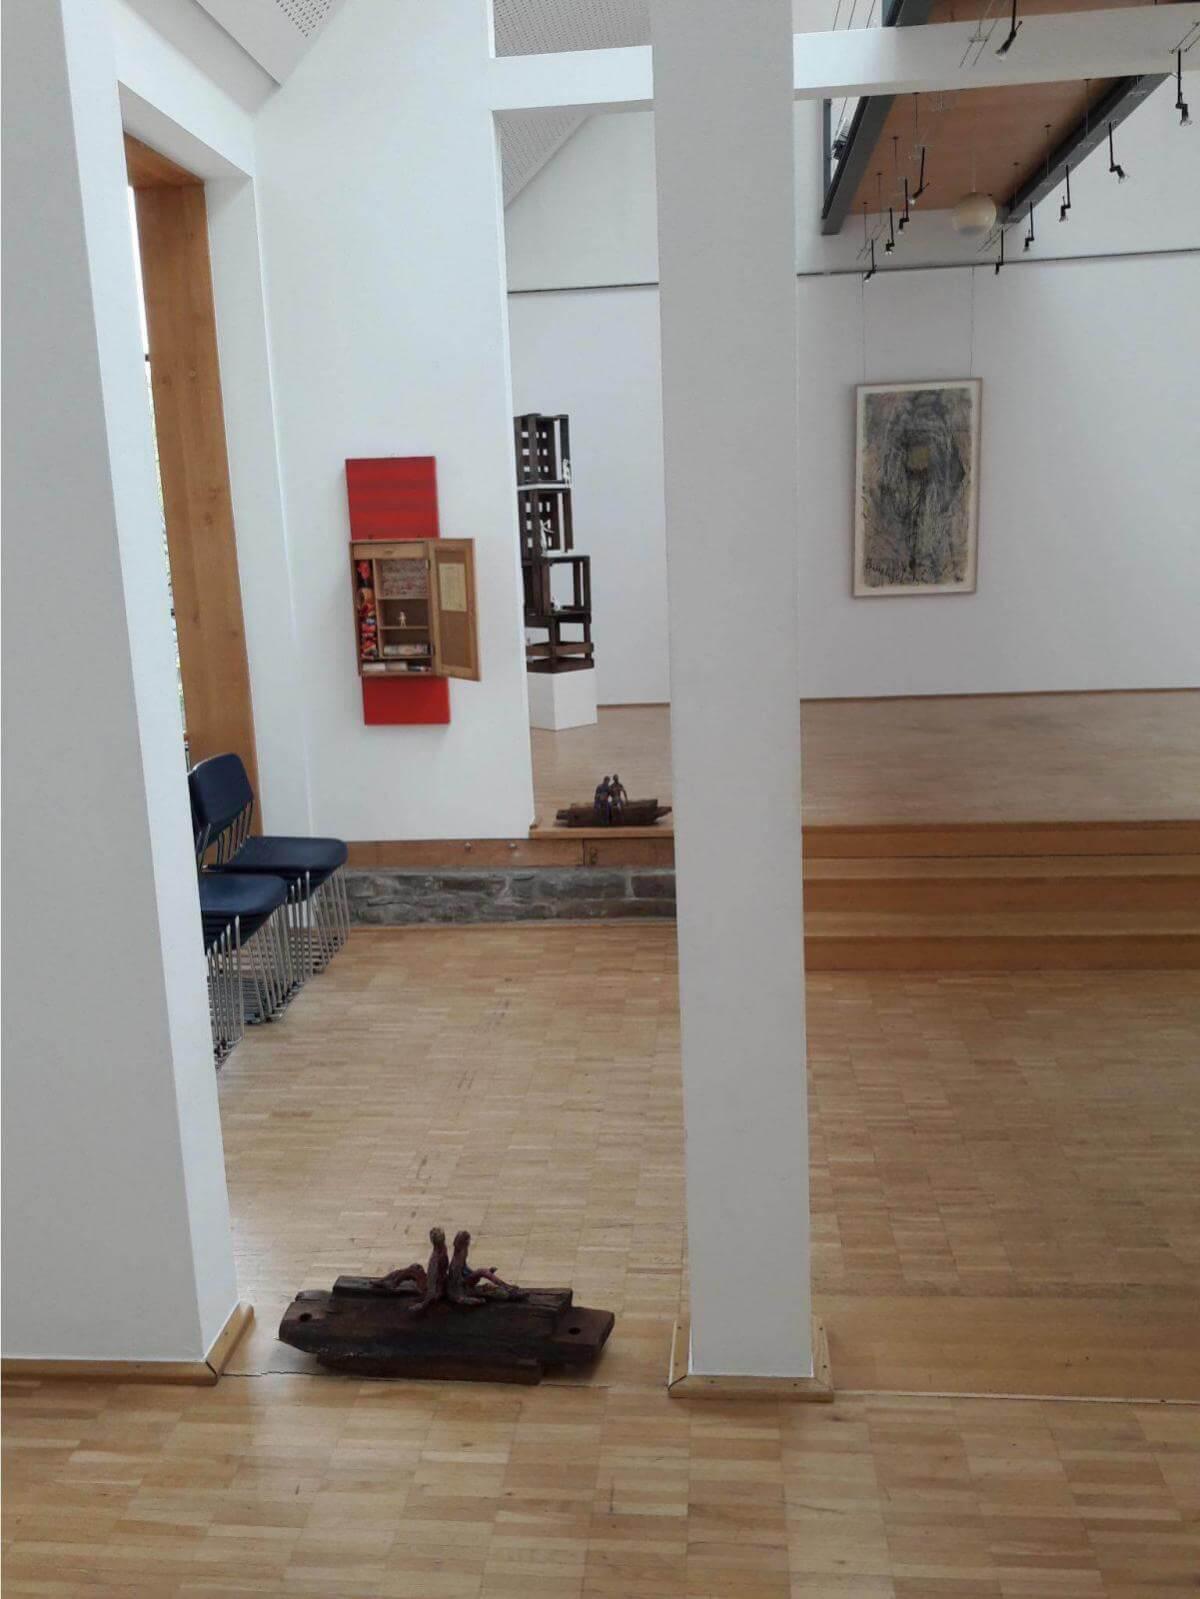 Ausstellung 16.11.2019 - 23:01